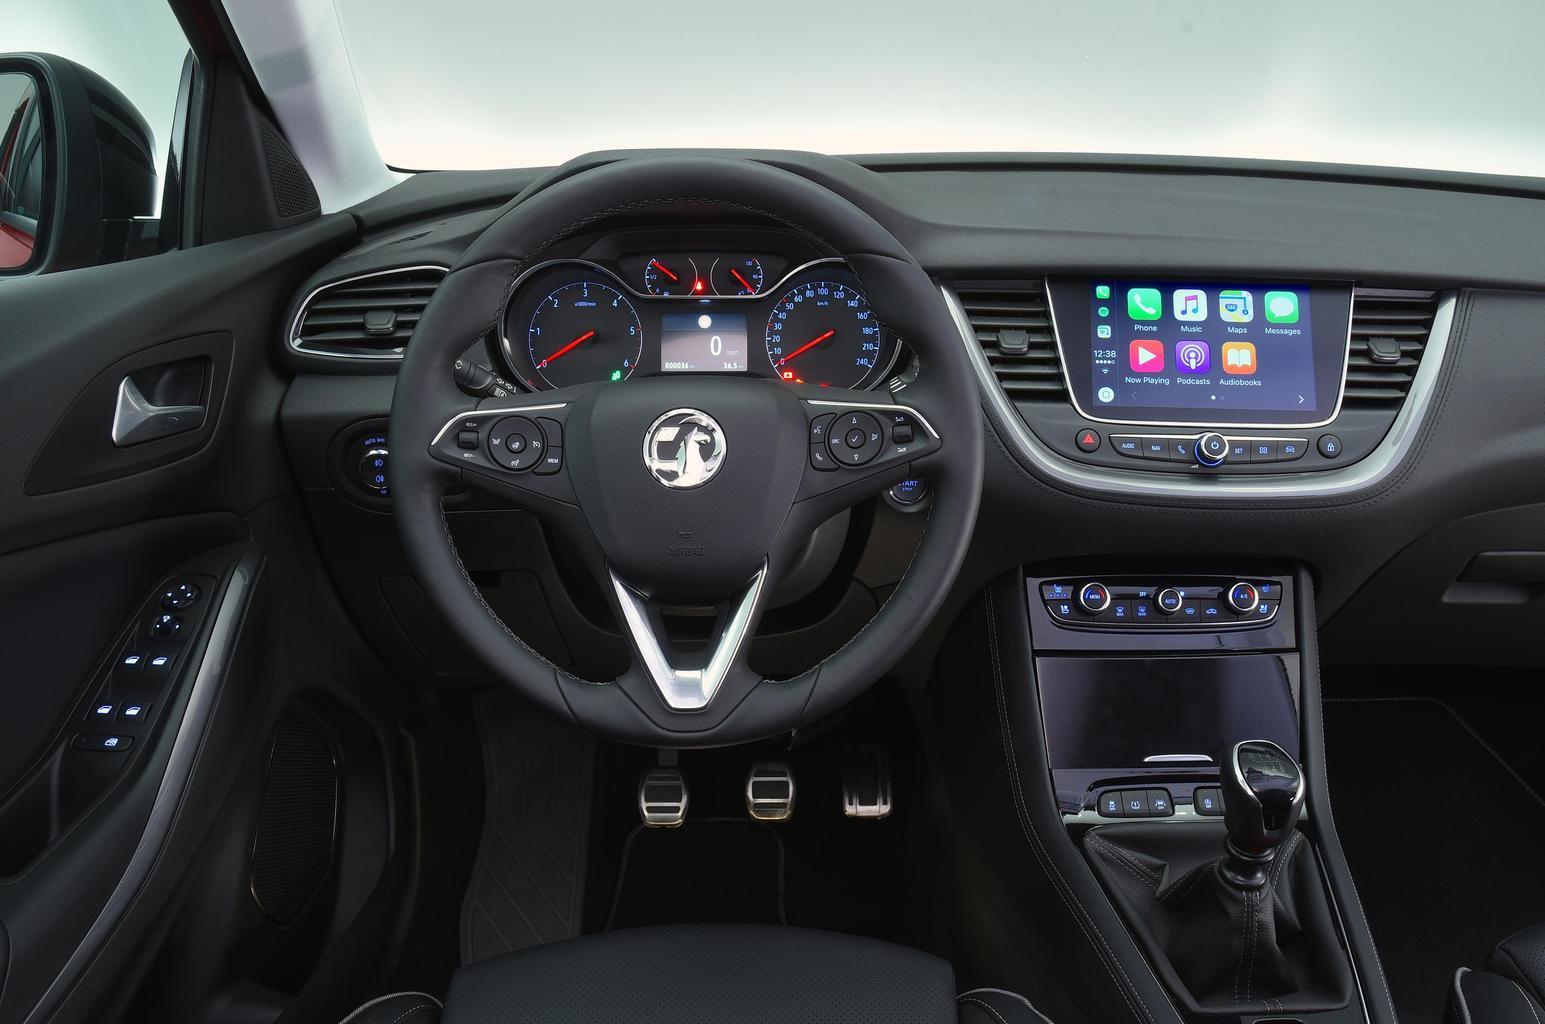 New Vauxhall Grandland X targets Nissan Qashqai